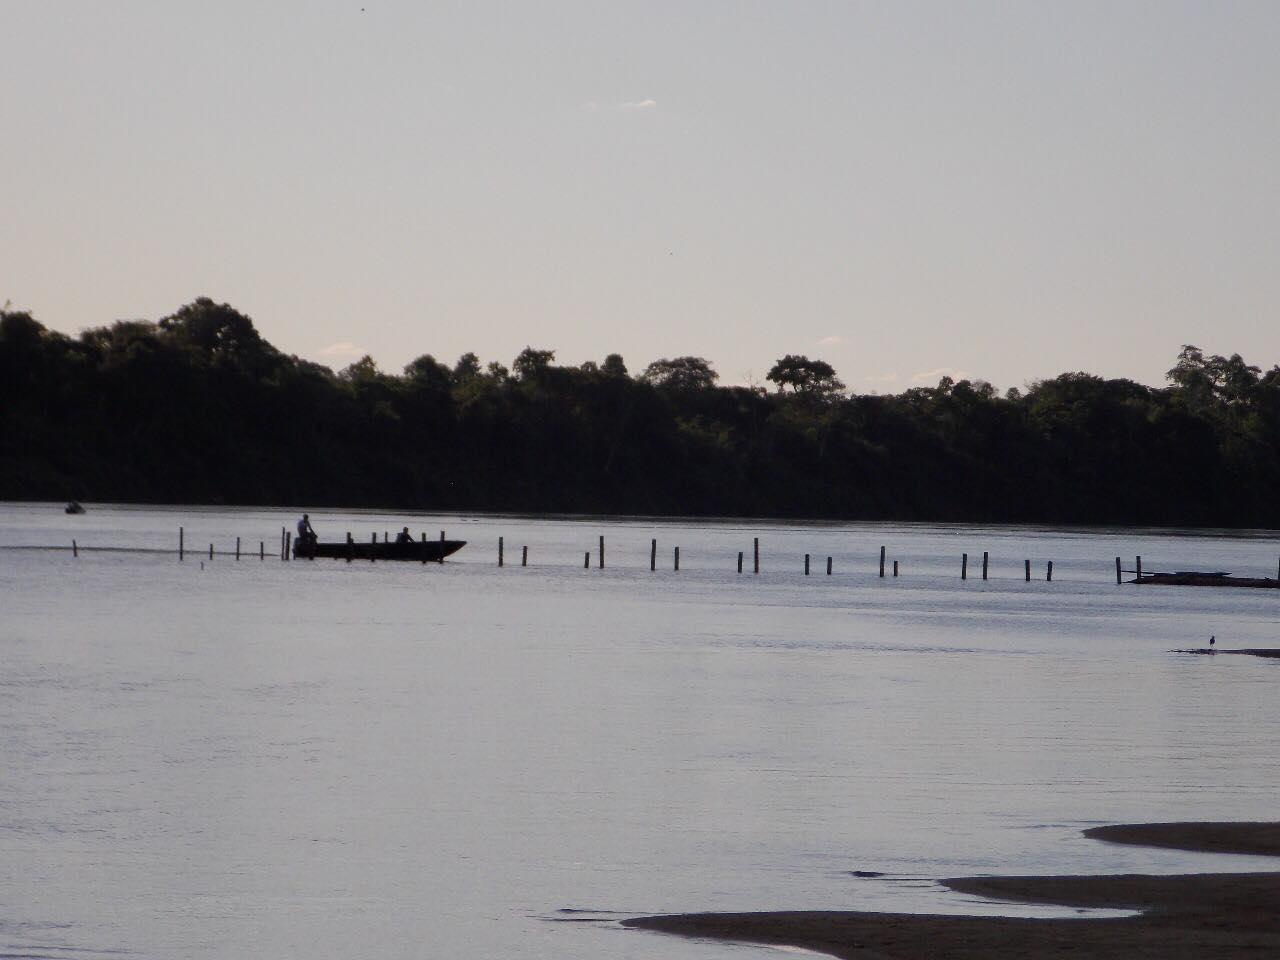 Praia da Tartaruga: Estrutura está sendo montada para receber os visitantes a partir do dia 30 de junho